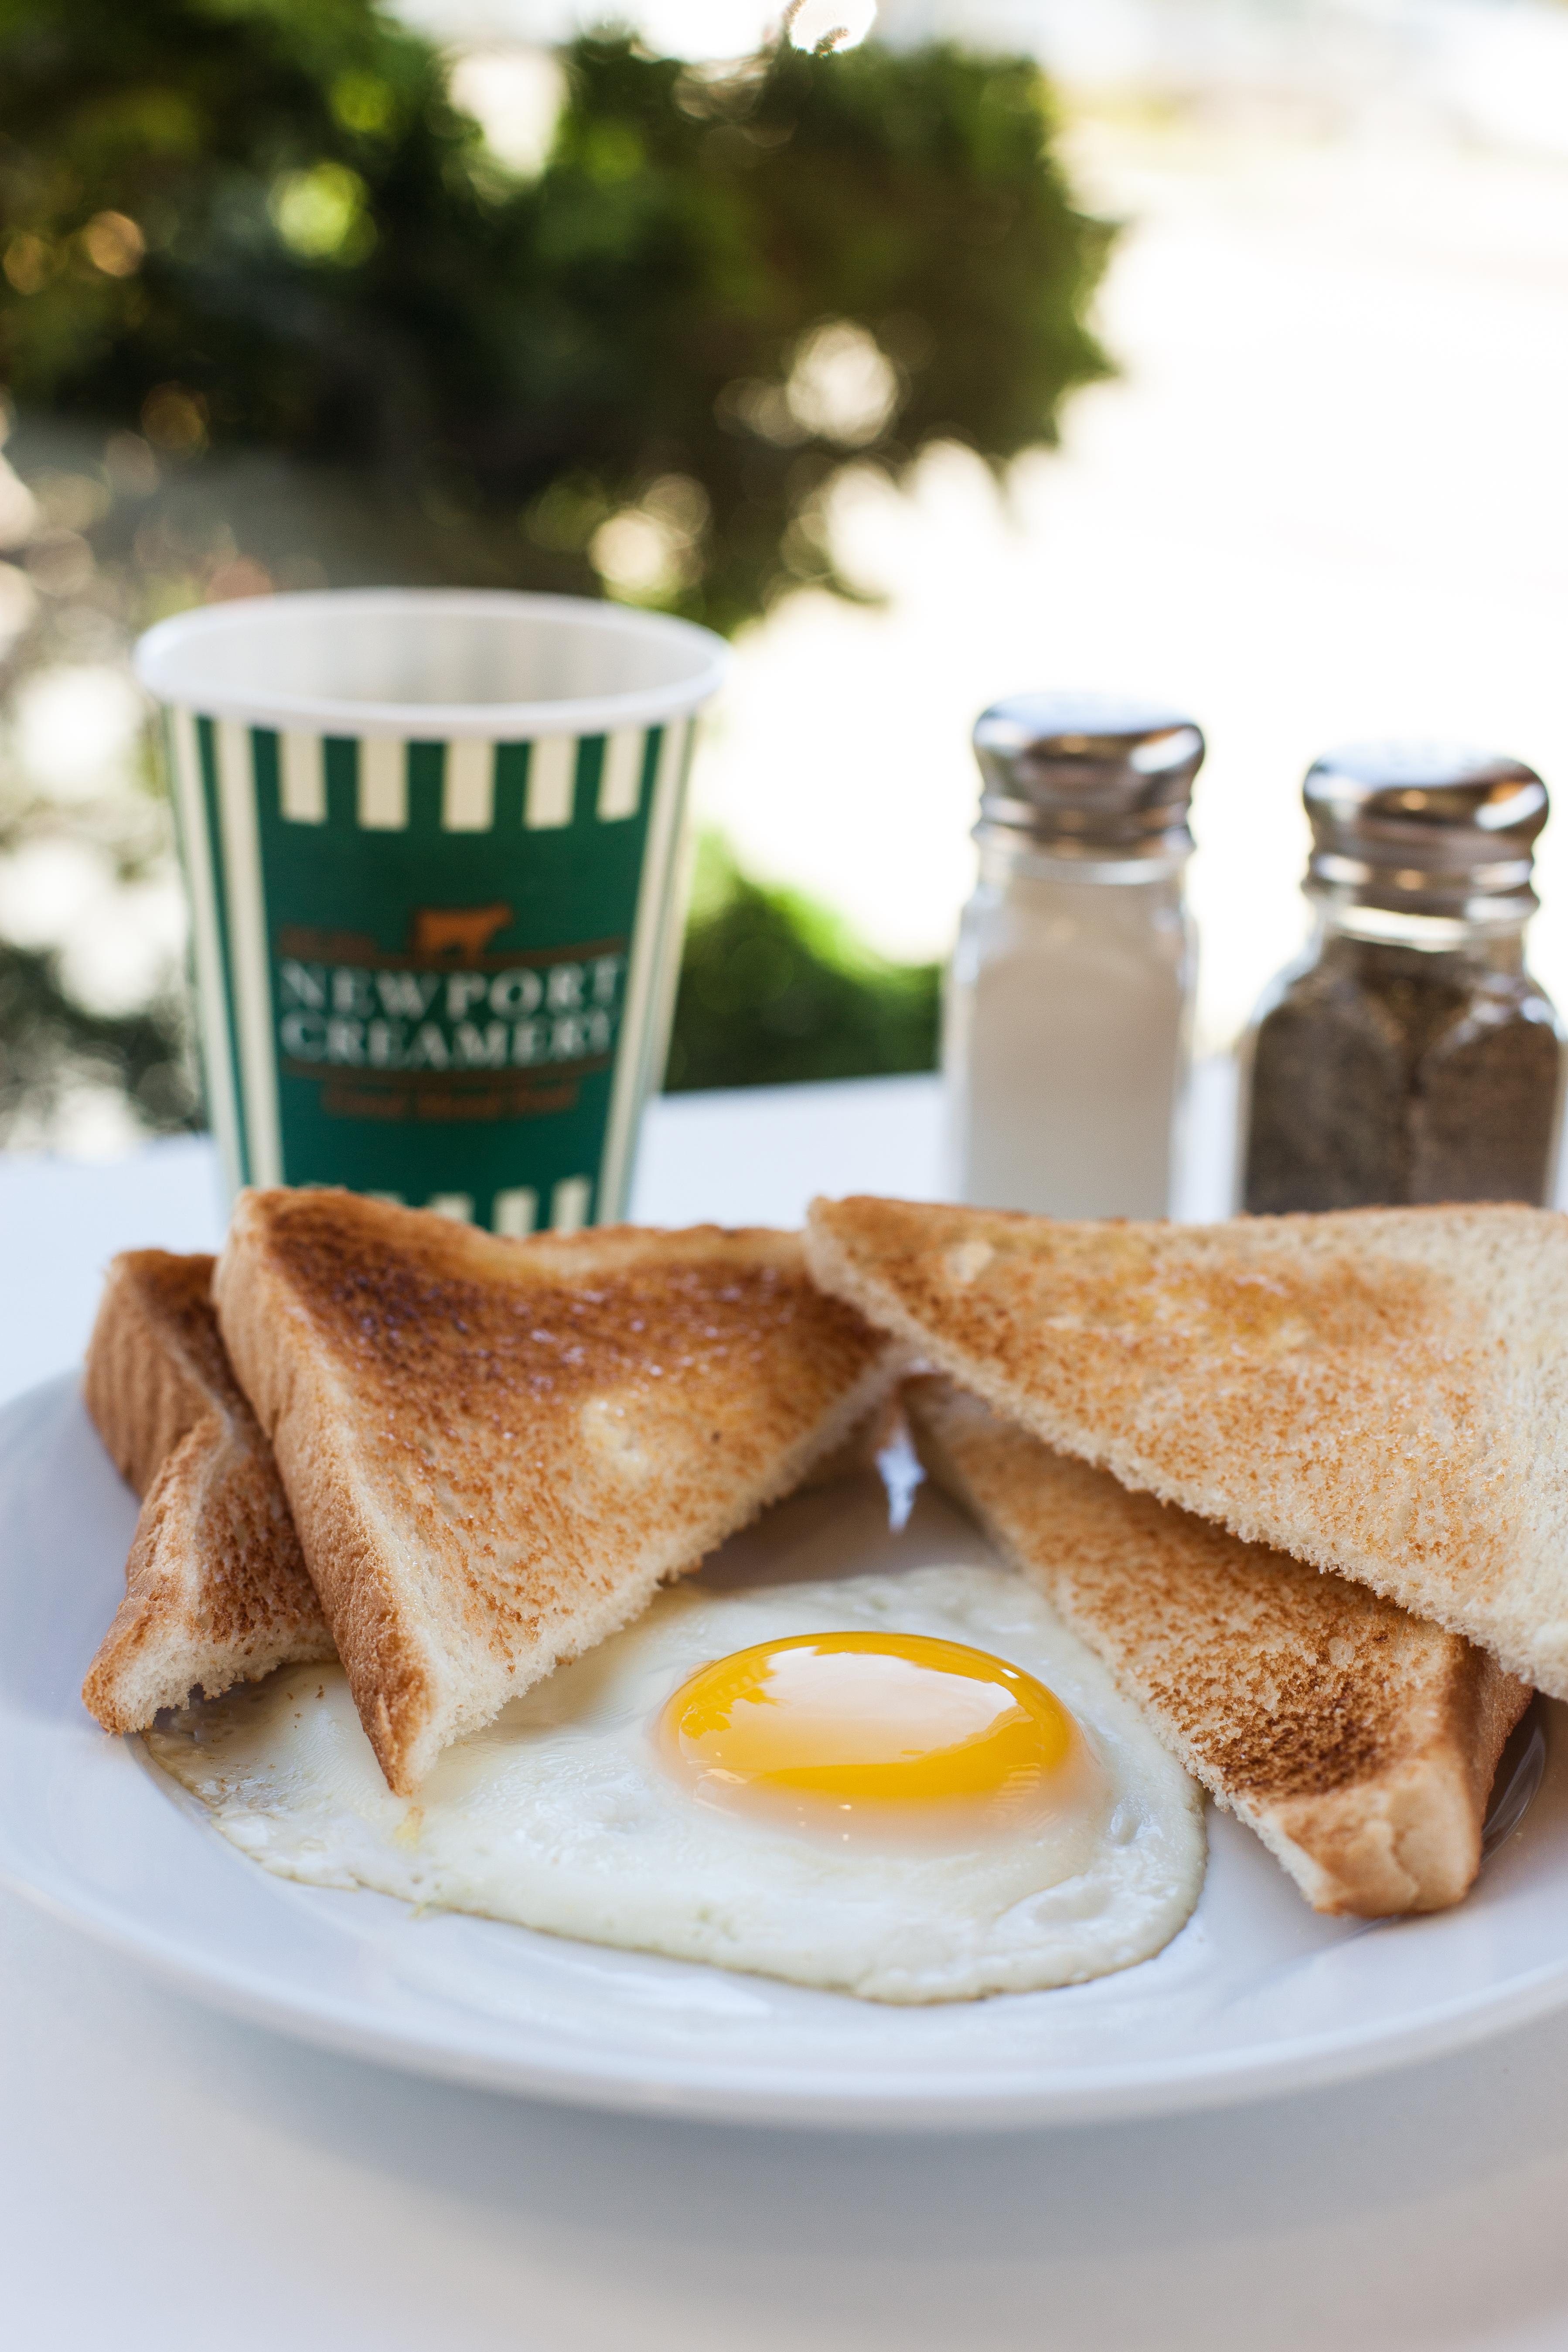 Senior Egg & Toast